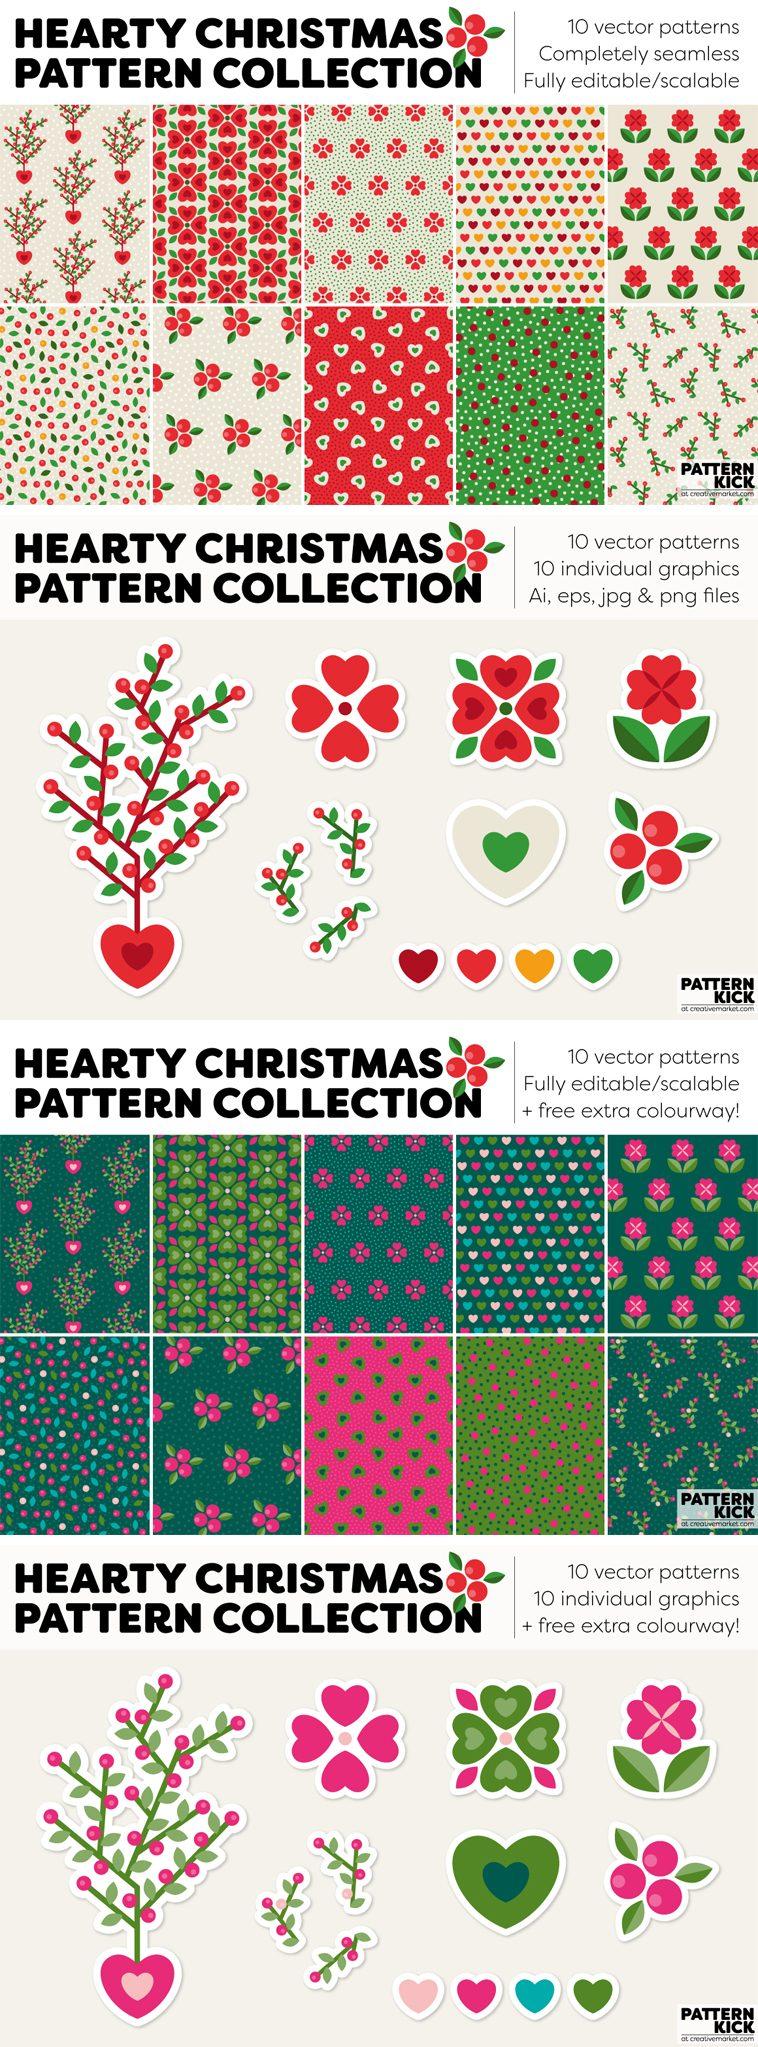 Christmas Prints and Patterns at Pattern Kick - Creative Market [4] | Pitter Pattern